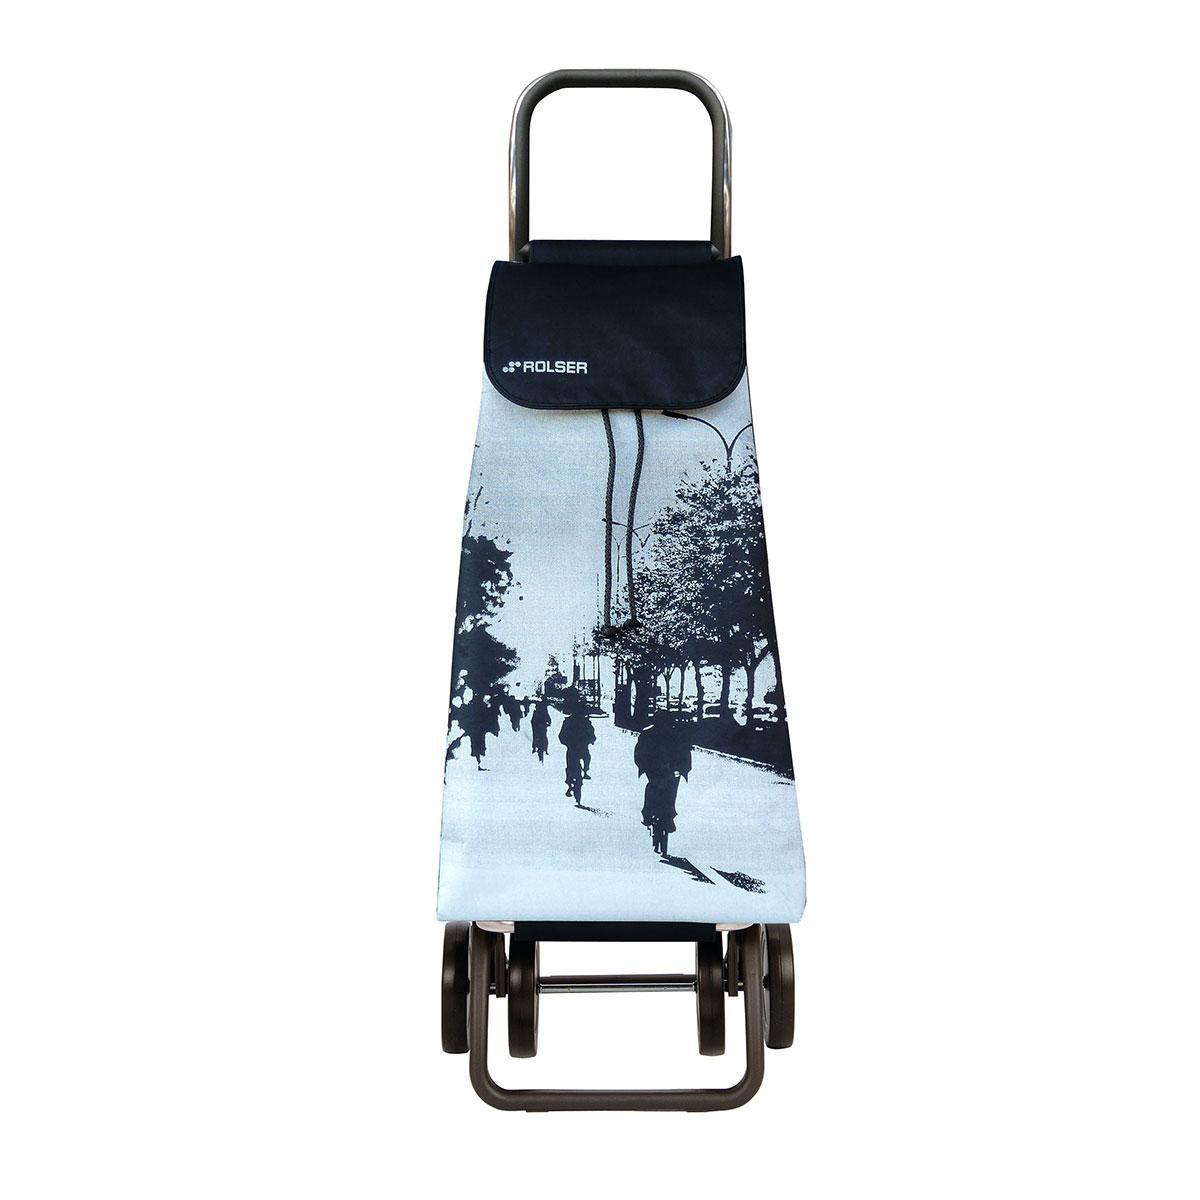 Shoppingvagn Rolser 2+2 Logic Imax City vit